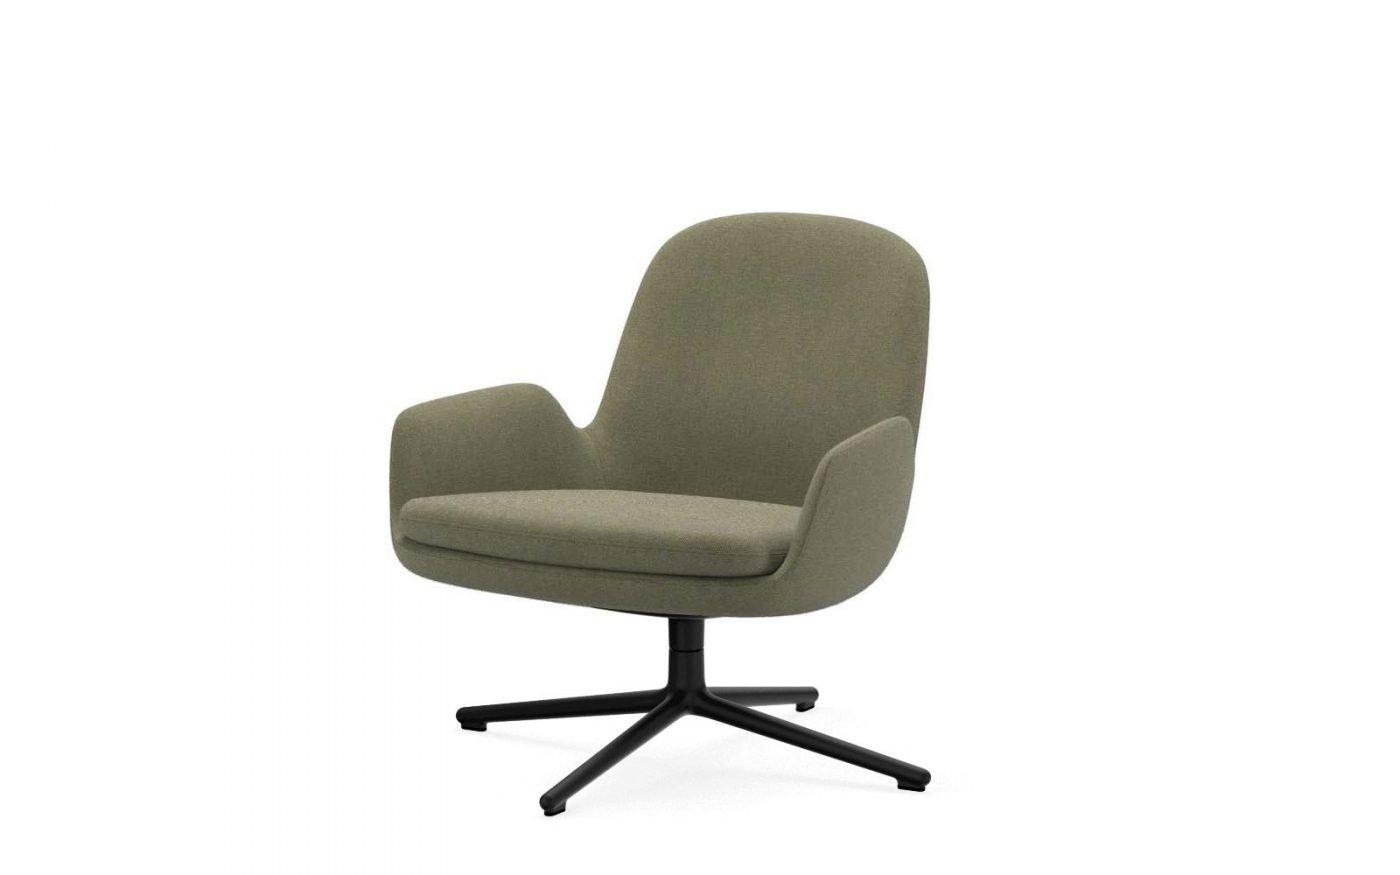 Era-Lounge-Chair-Low-Swivel-normann-copenhagen-Breeze-Fusion-4804